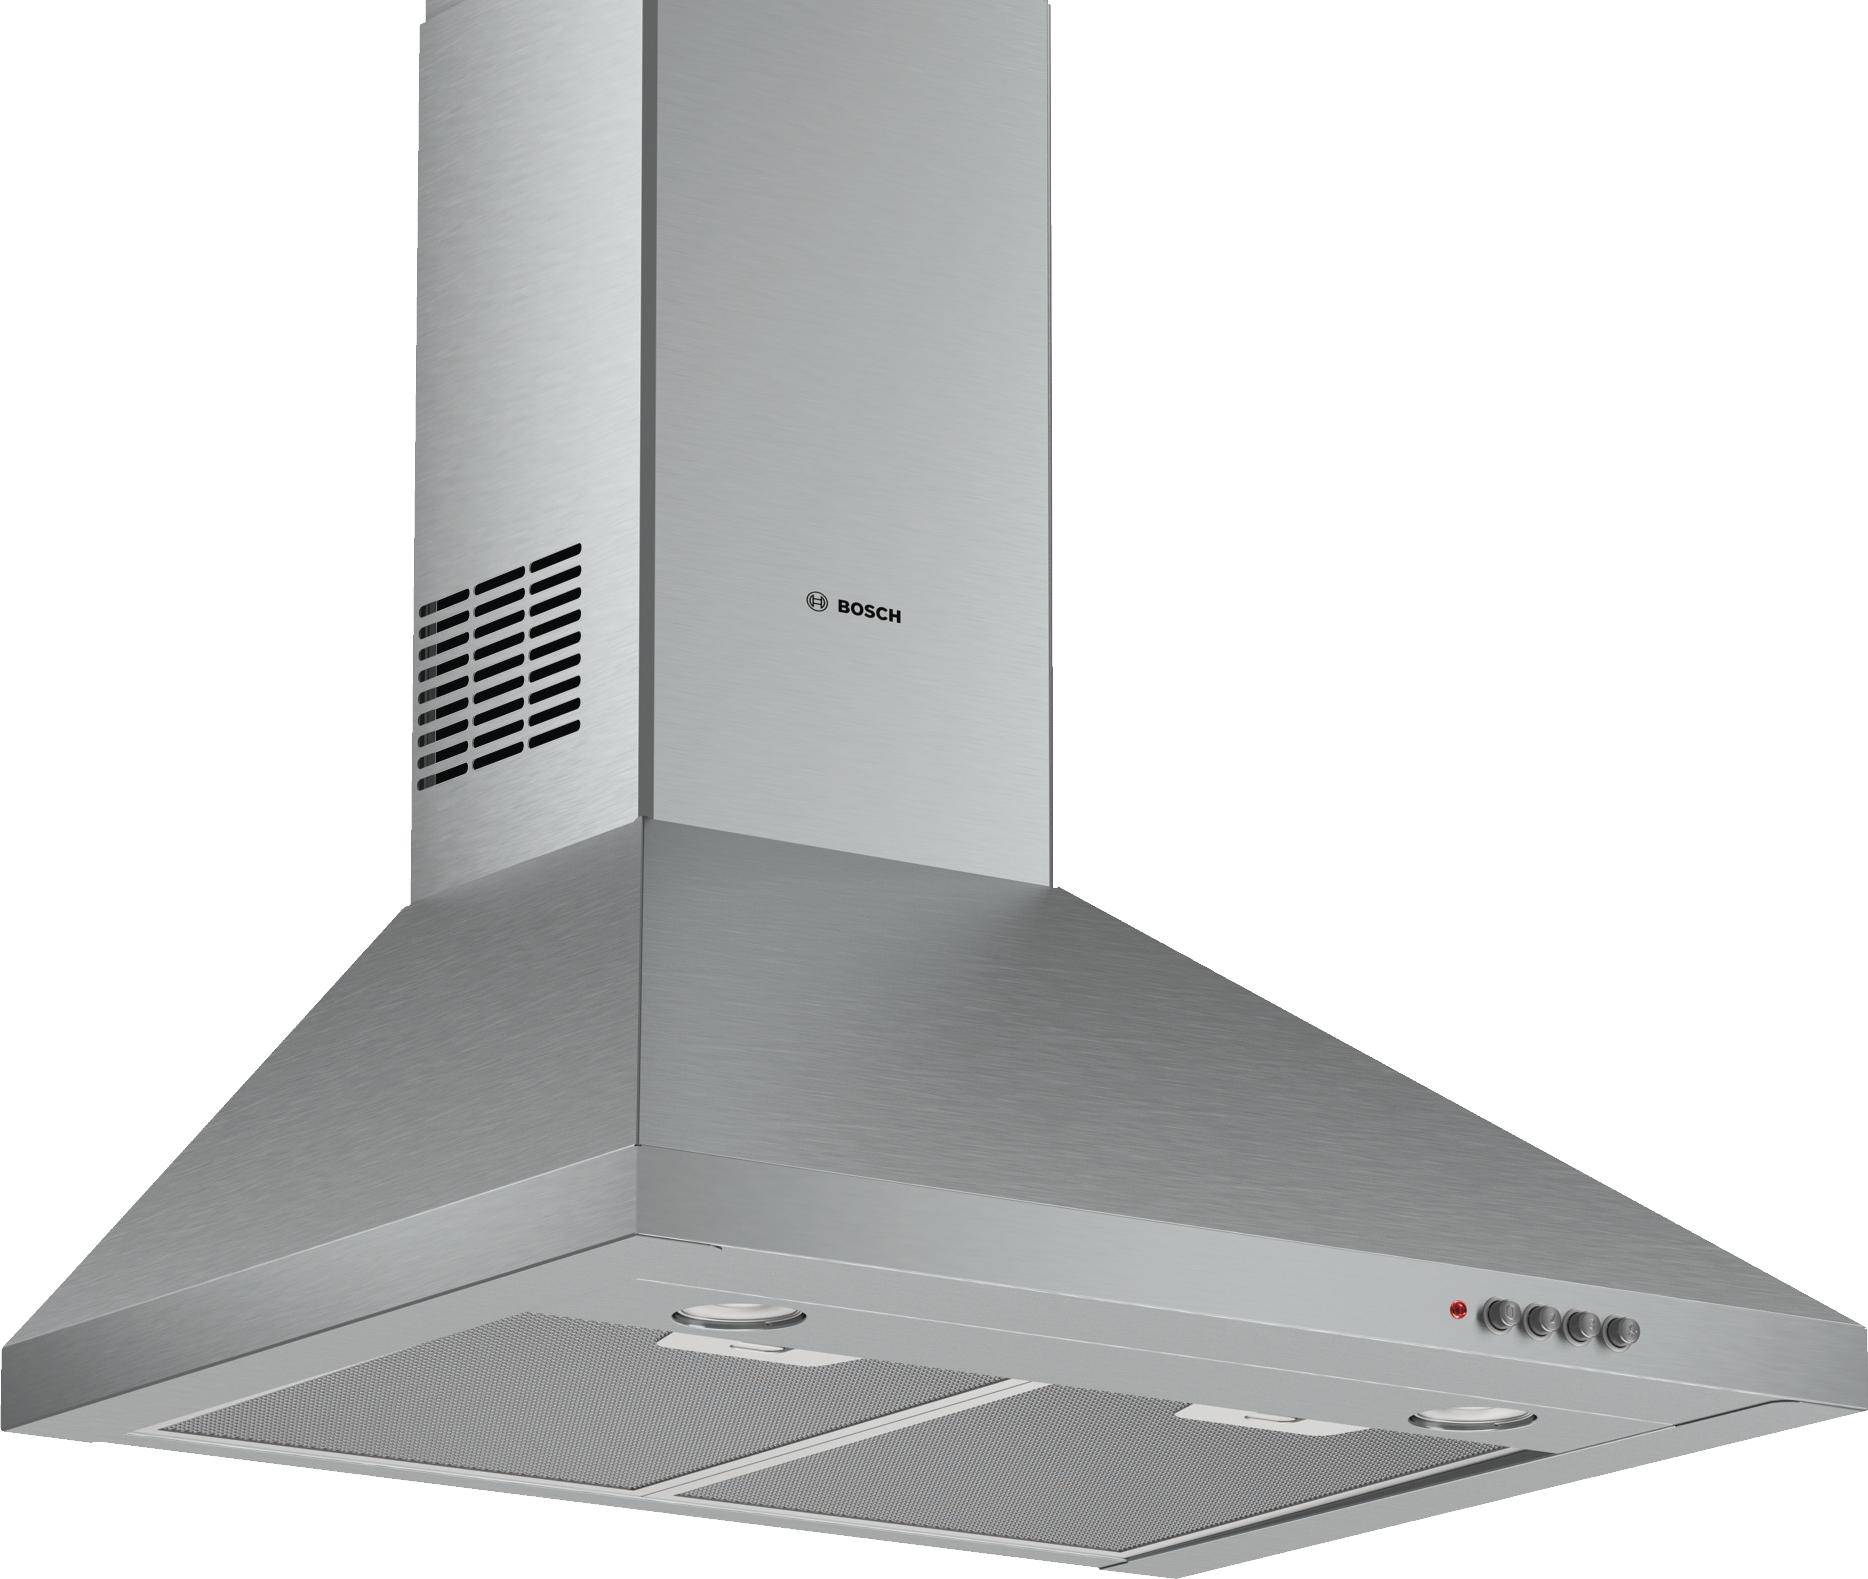 Bosch ENERGY STAR Ventilation Hoods